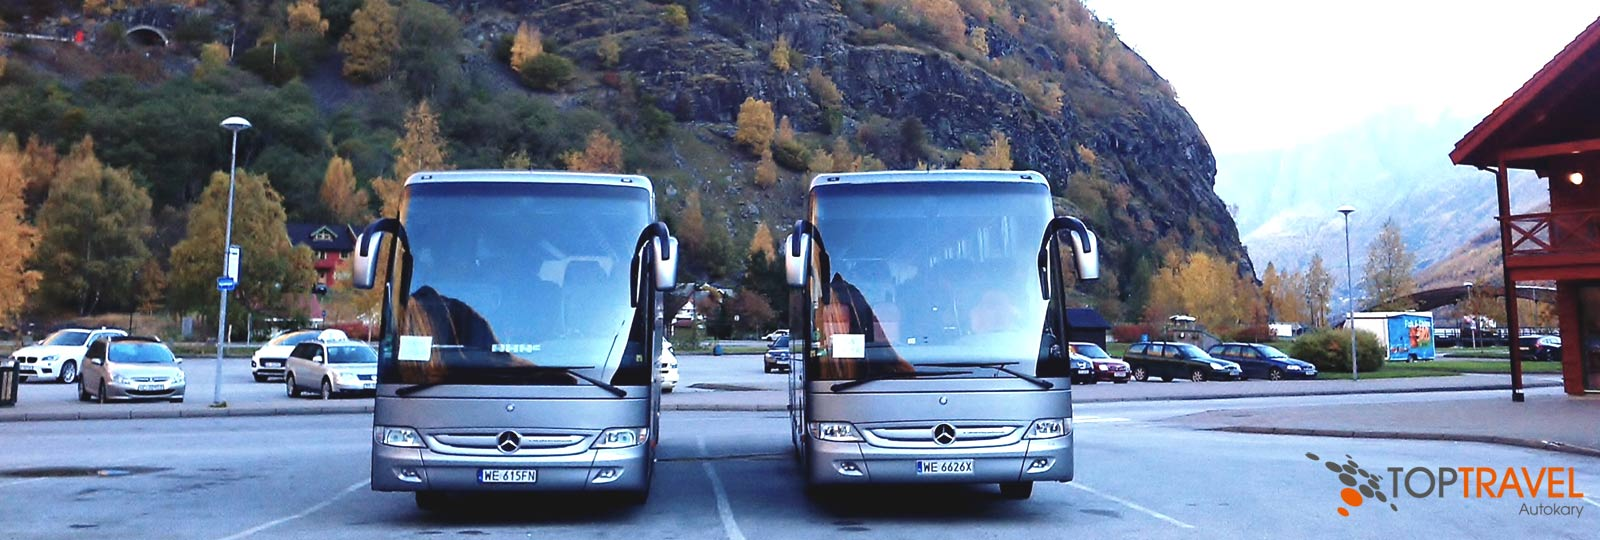 TOP TRAVEL Luksusowe autokary Mercedes Tourismo